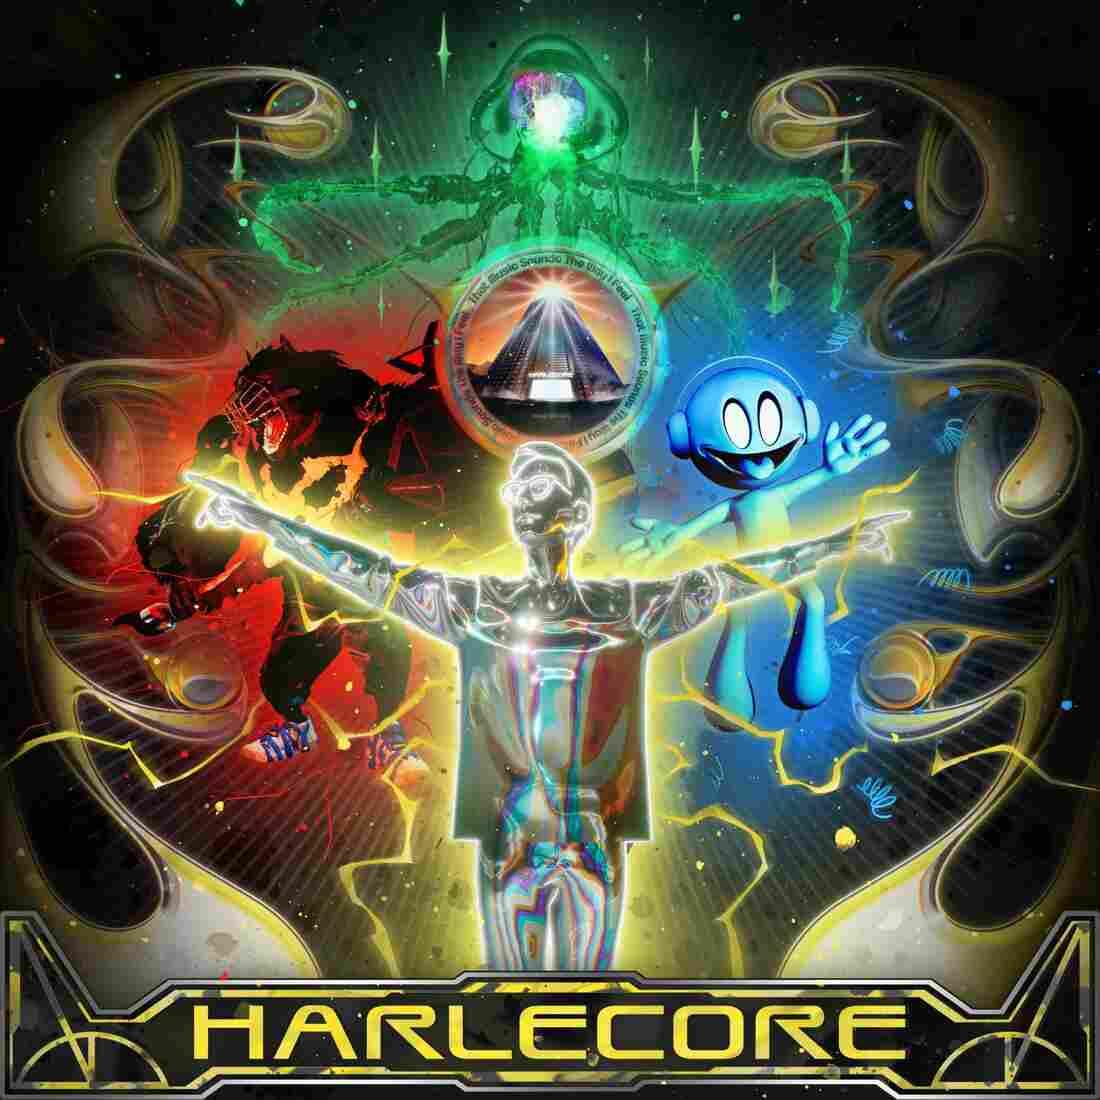 Danny L Harle, Harlecore